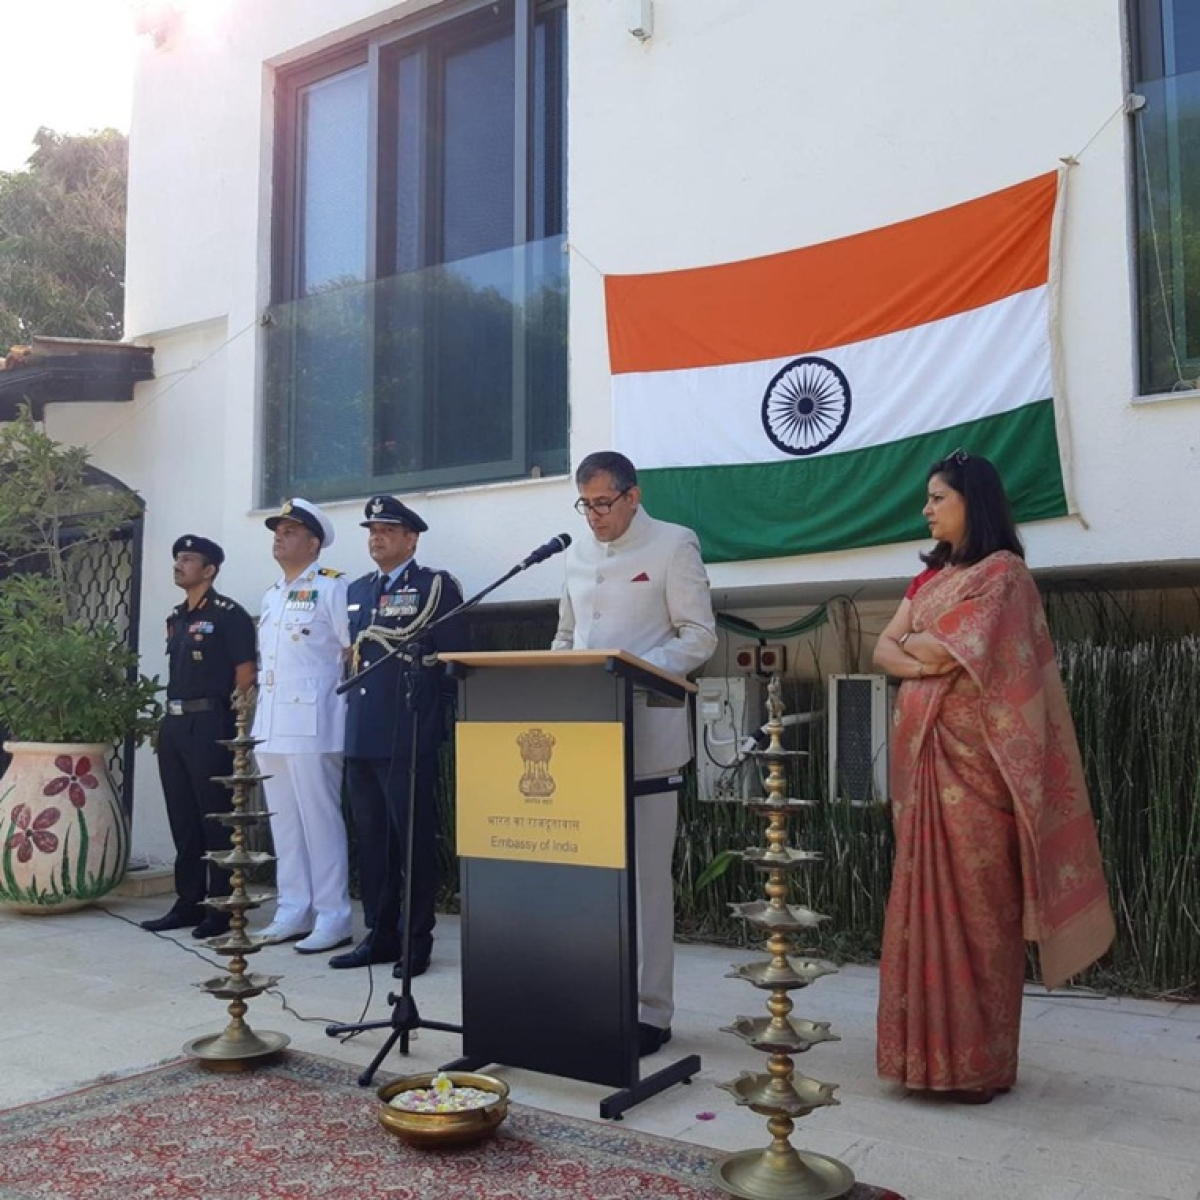 India appoints Pavan Kapoor as ambassador to UAE